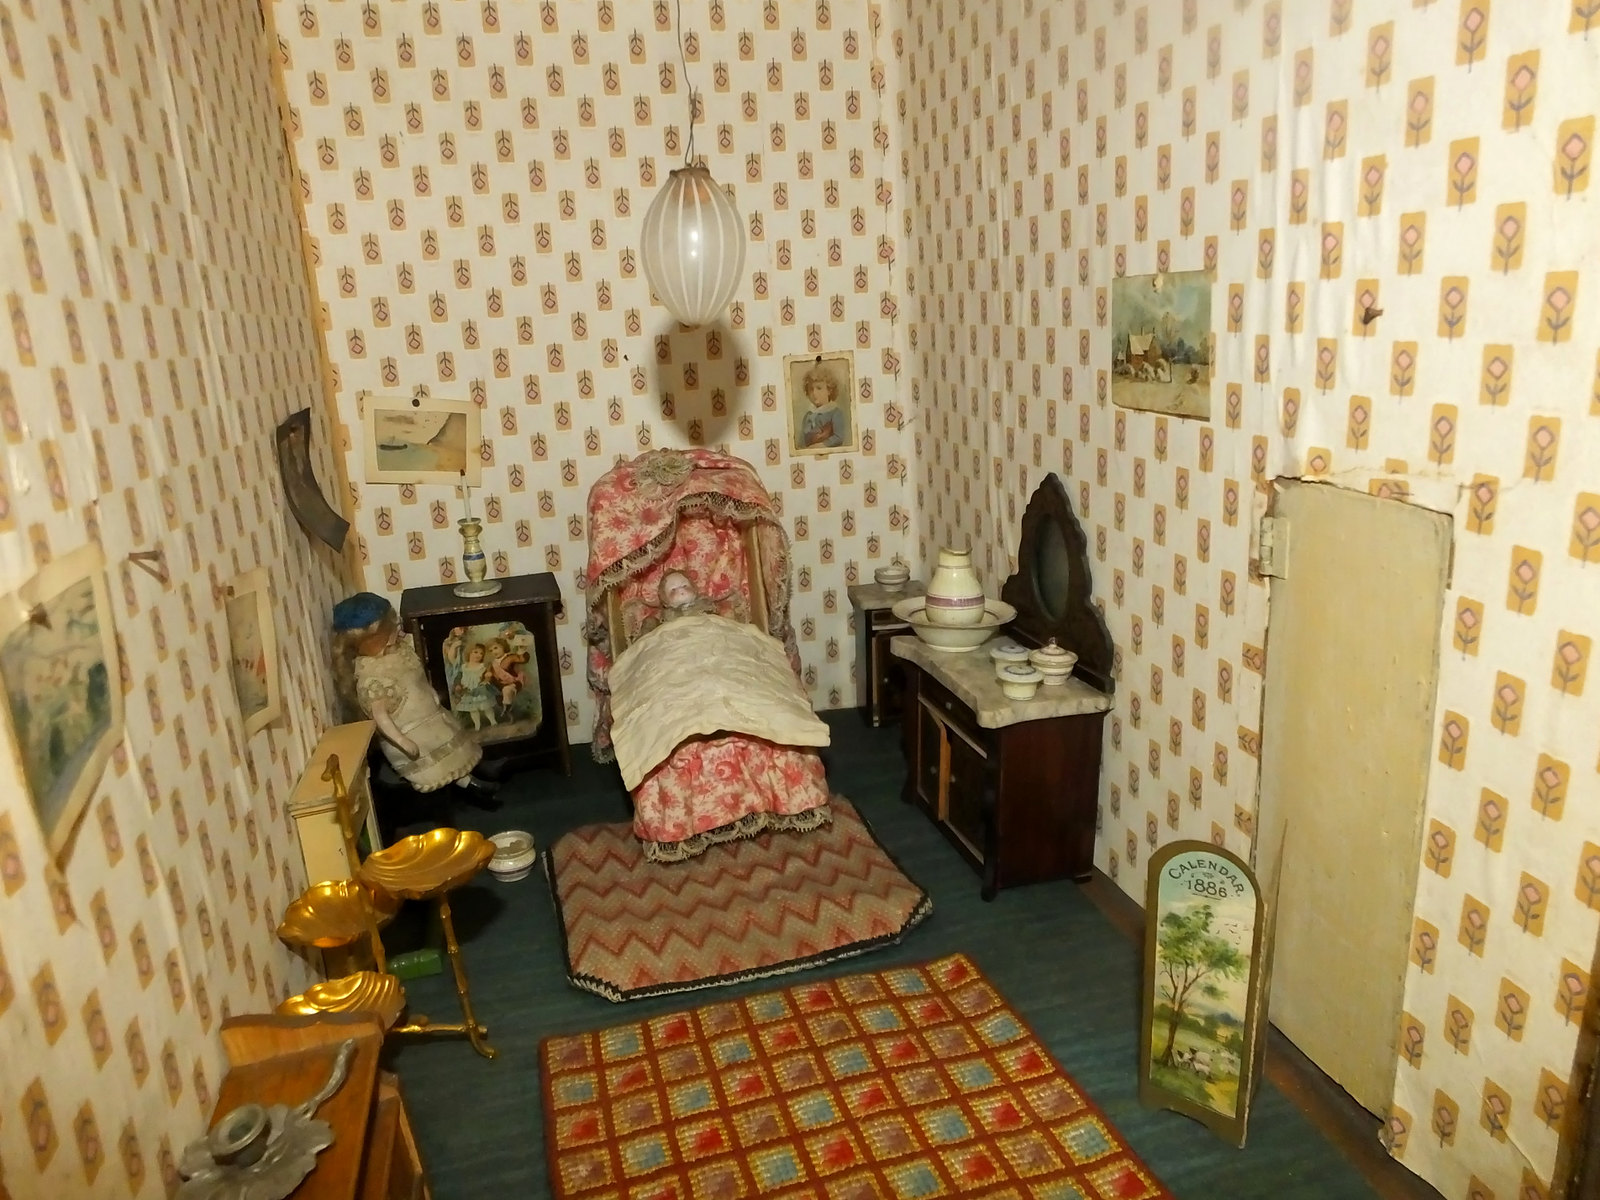 Constance Dahl's 1882 Dolls House. Credit Clem Rutter